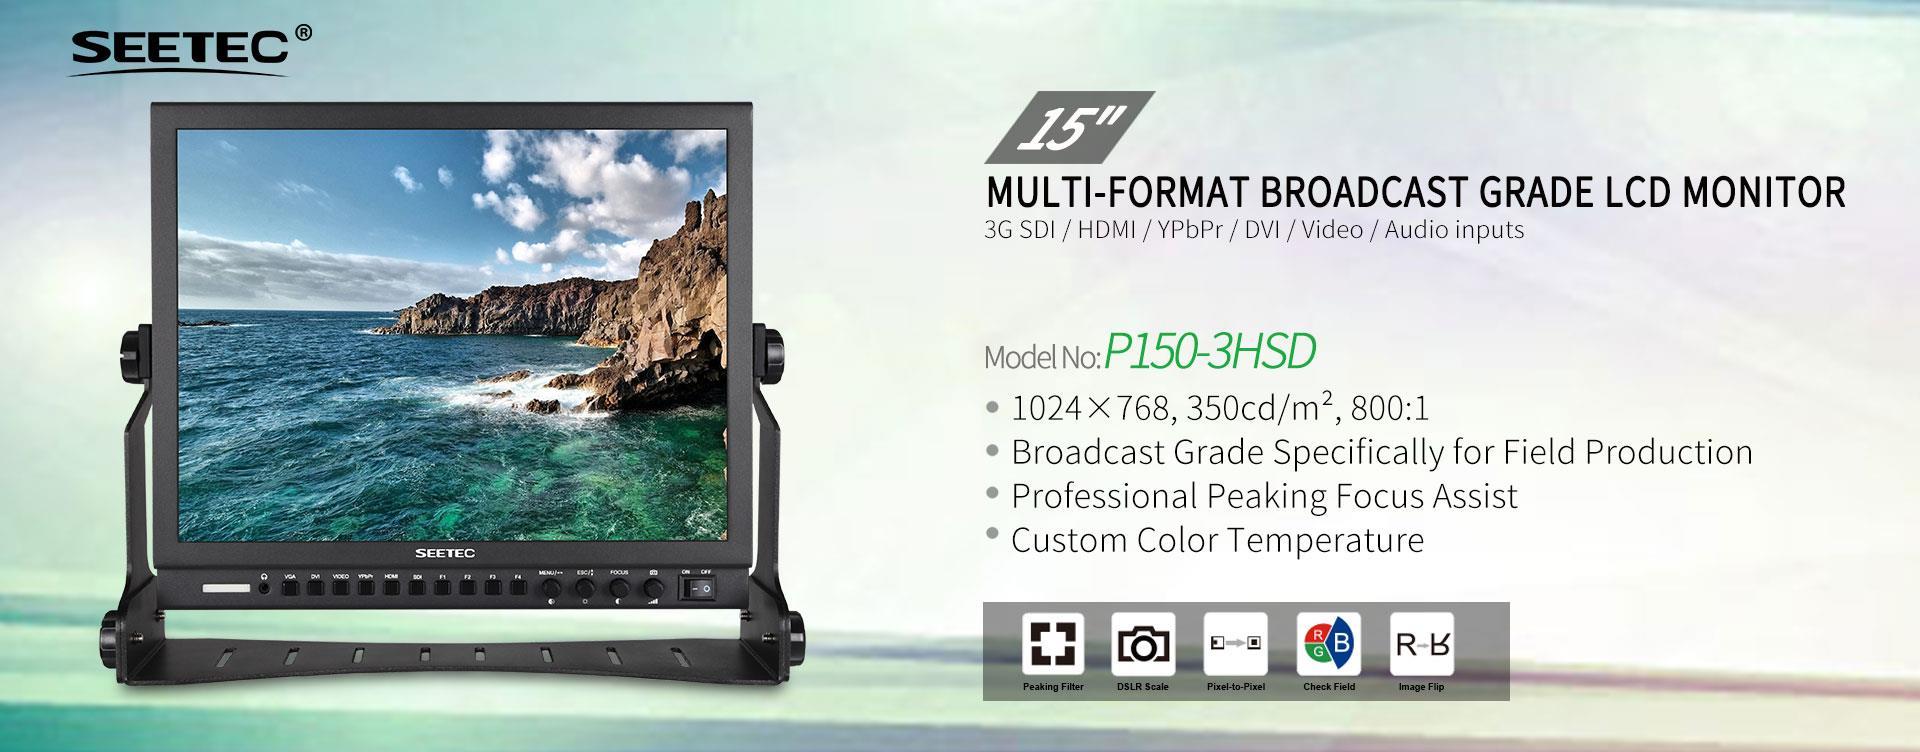 Monitor P150-3HSD SEETEC